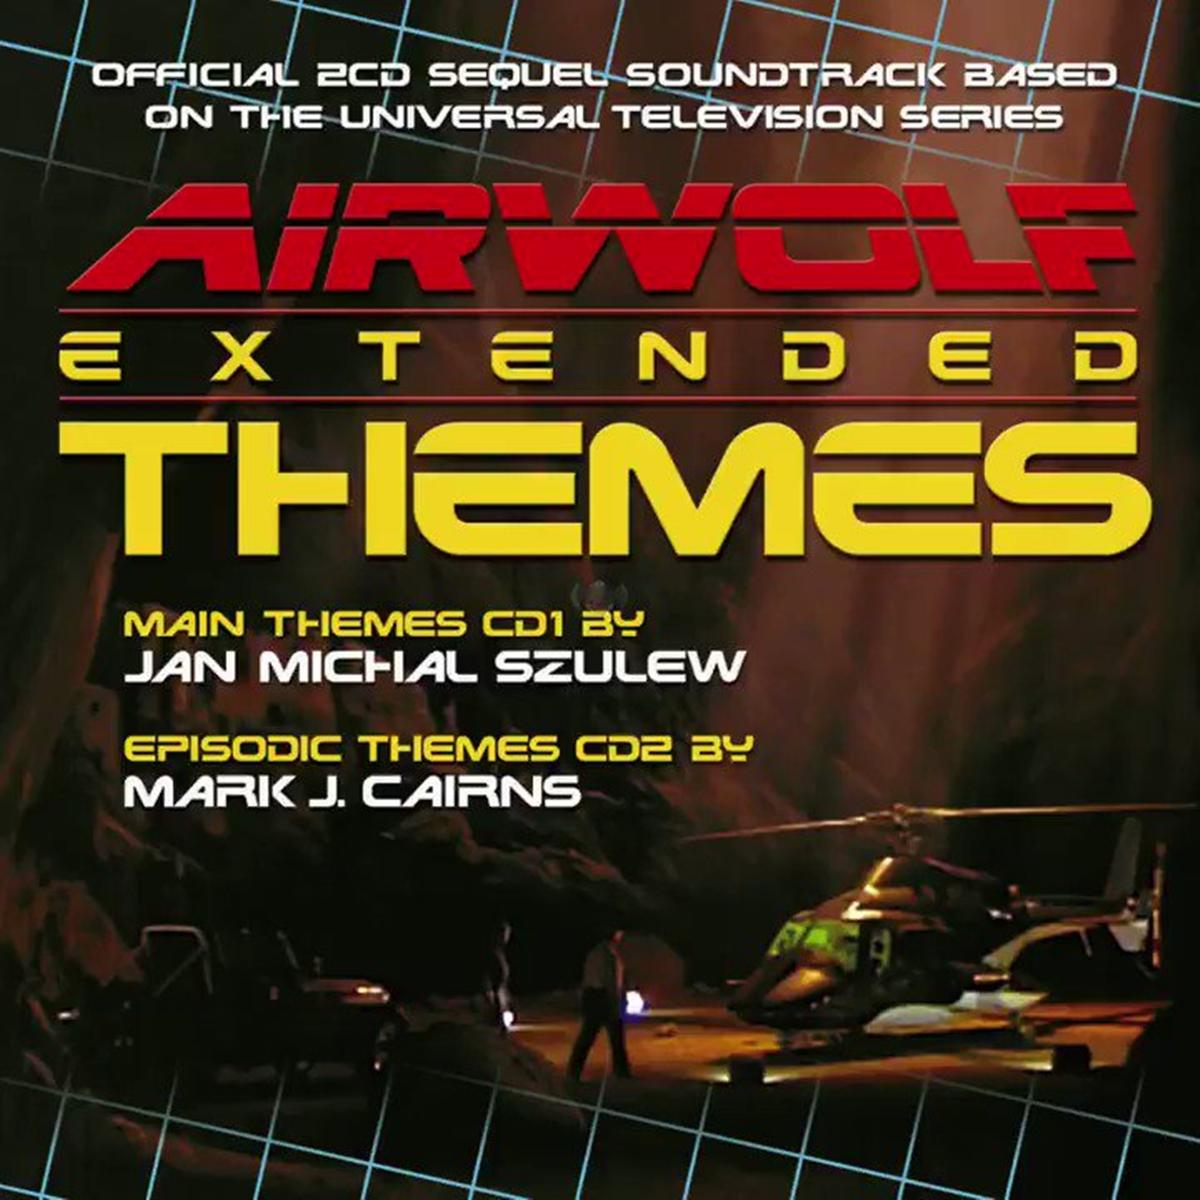 Airwolf themes CD